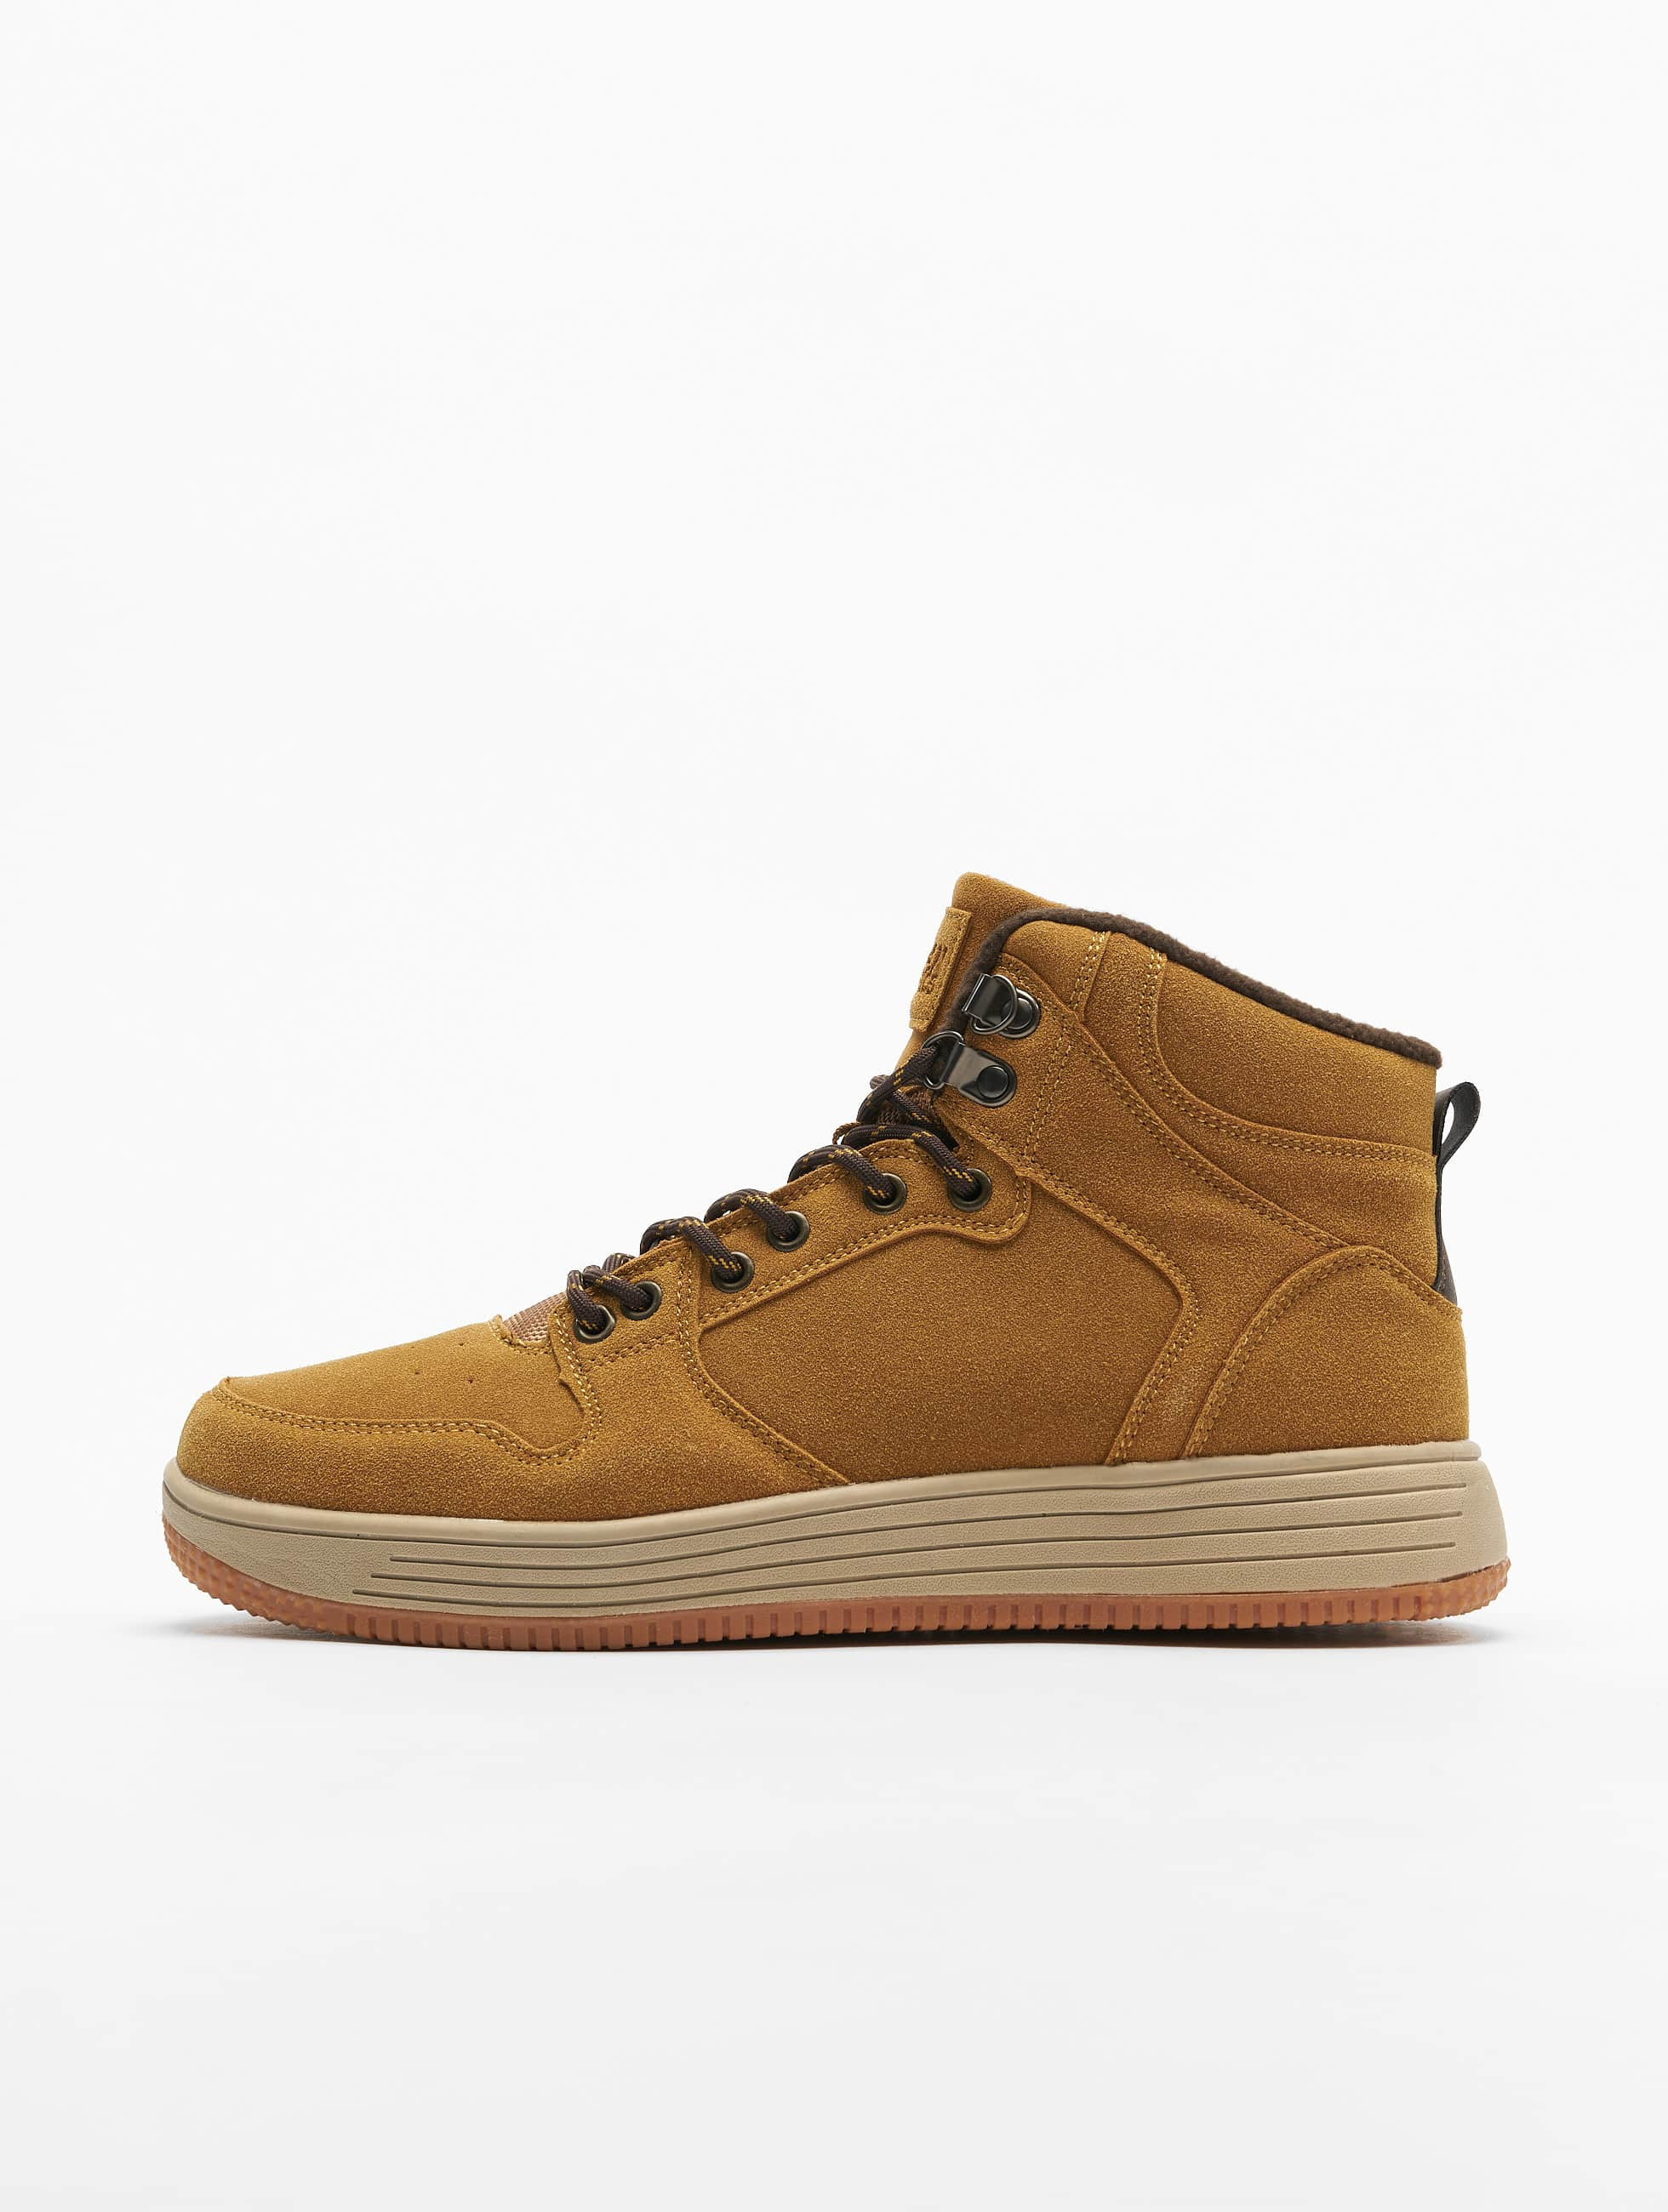 Urban Classics High Top Winter Sneakers Honey